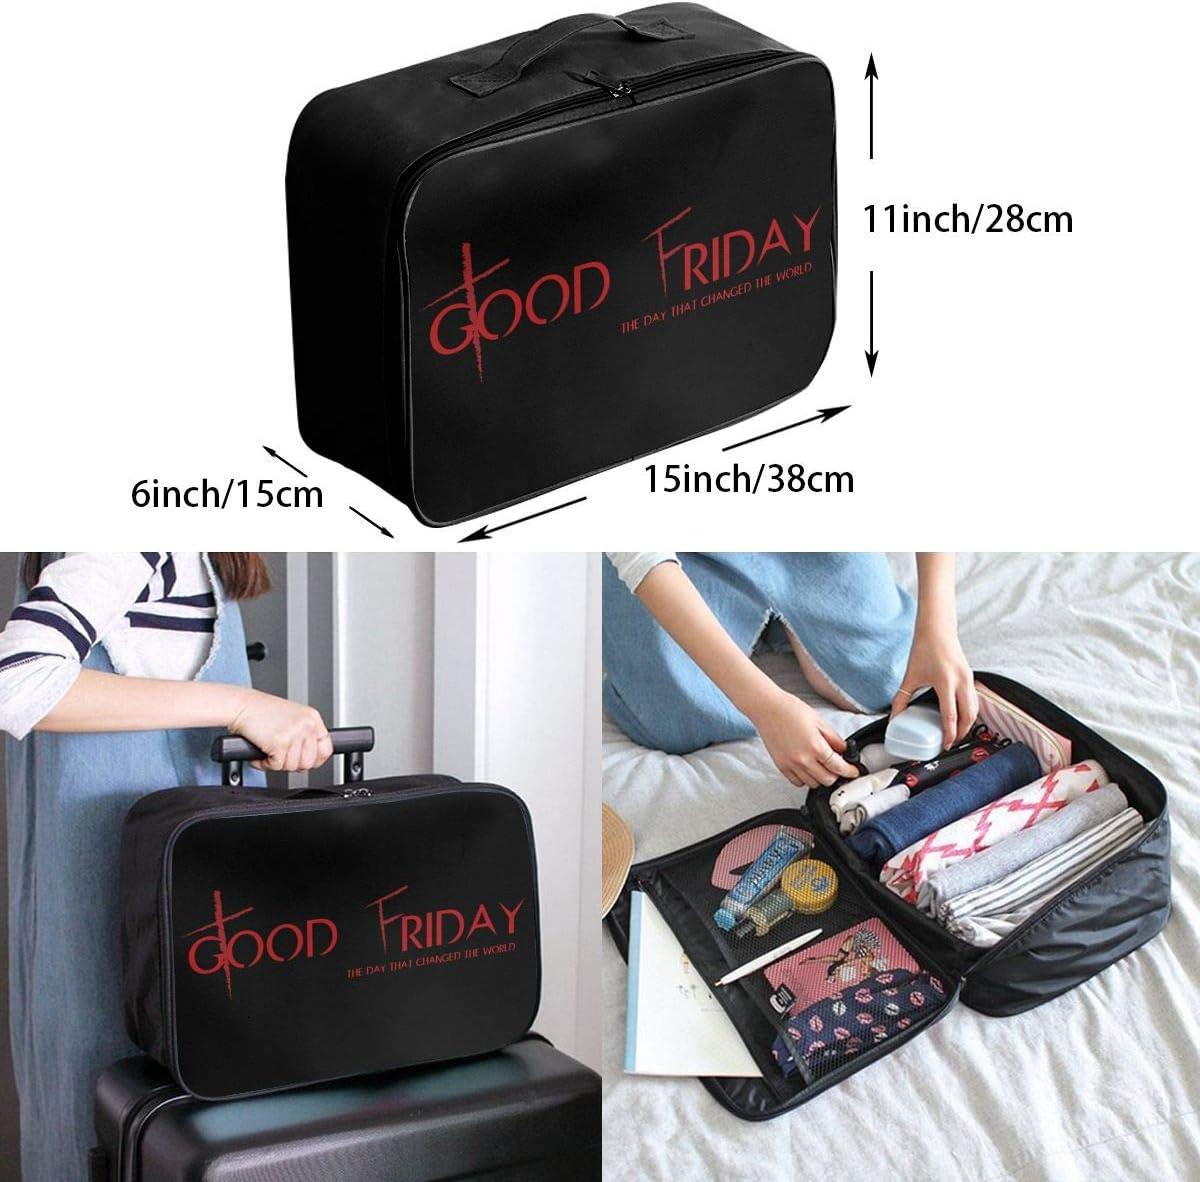 Good Friday.jpeg Travel Carry-on Luggage Weekender Bag Overnight Tote Flight Duffel In Trolley Handle